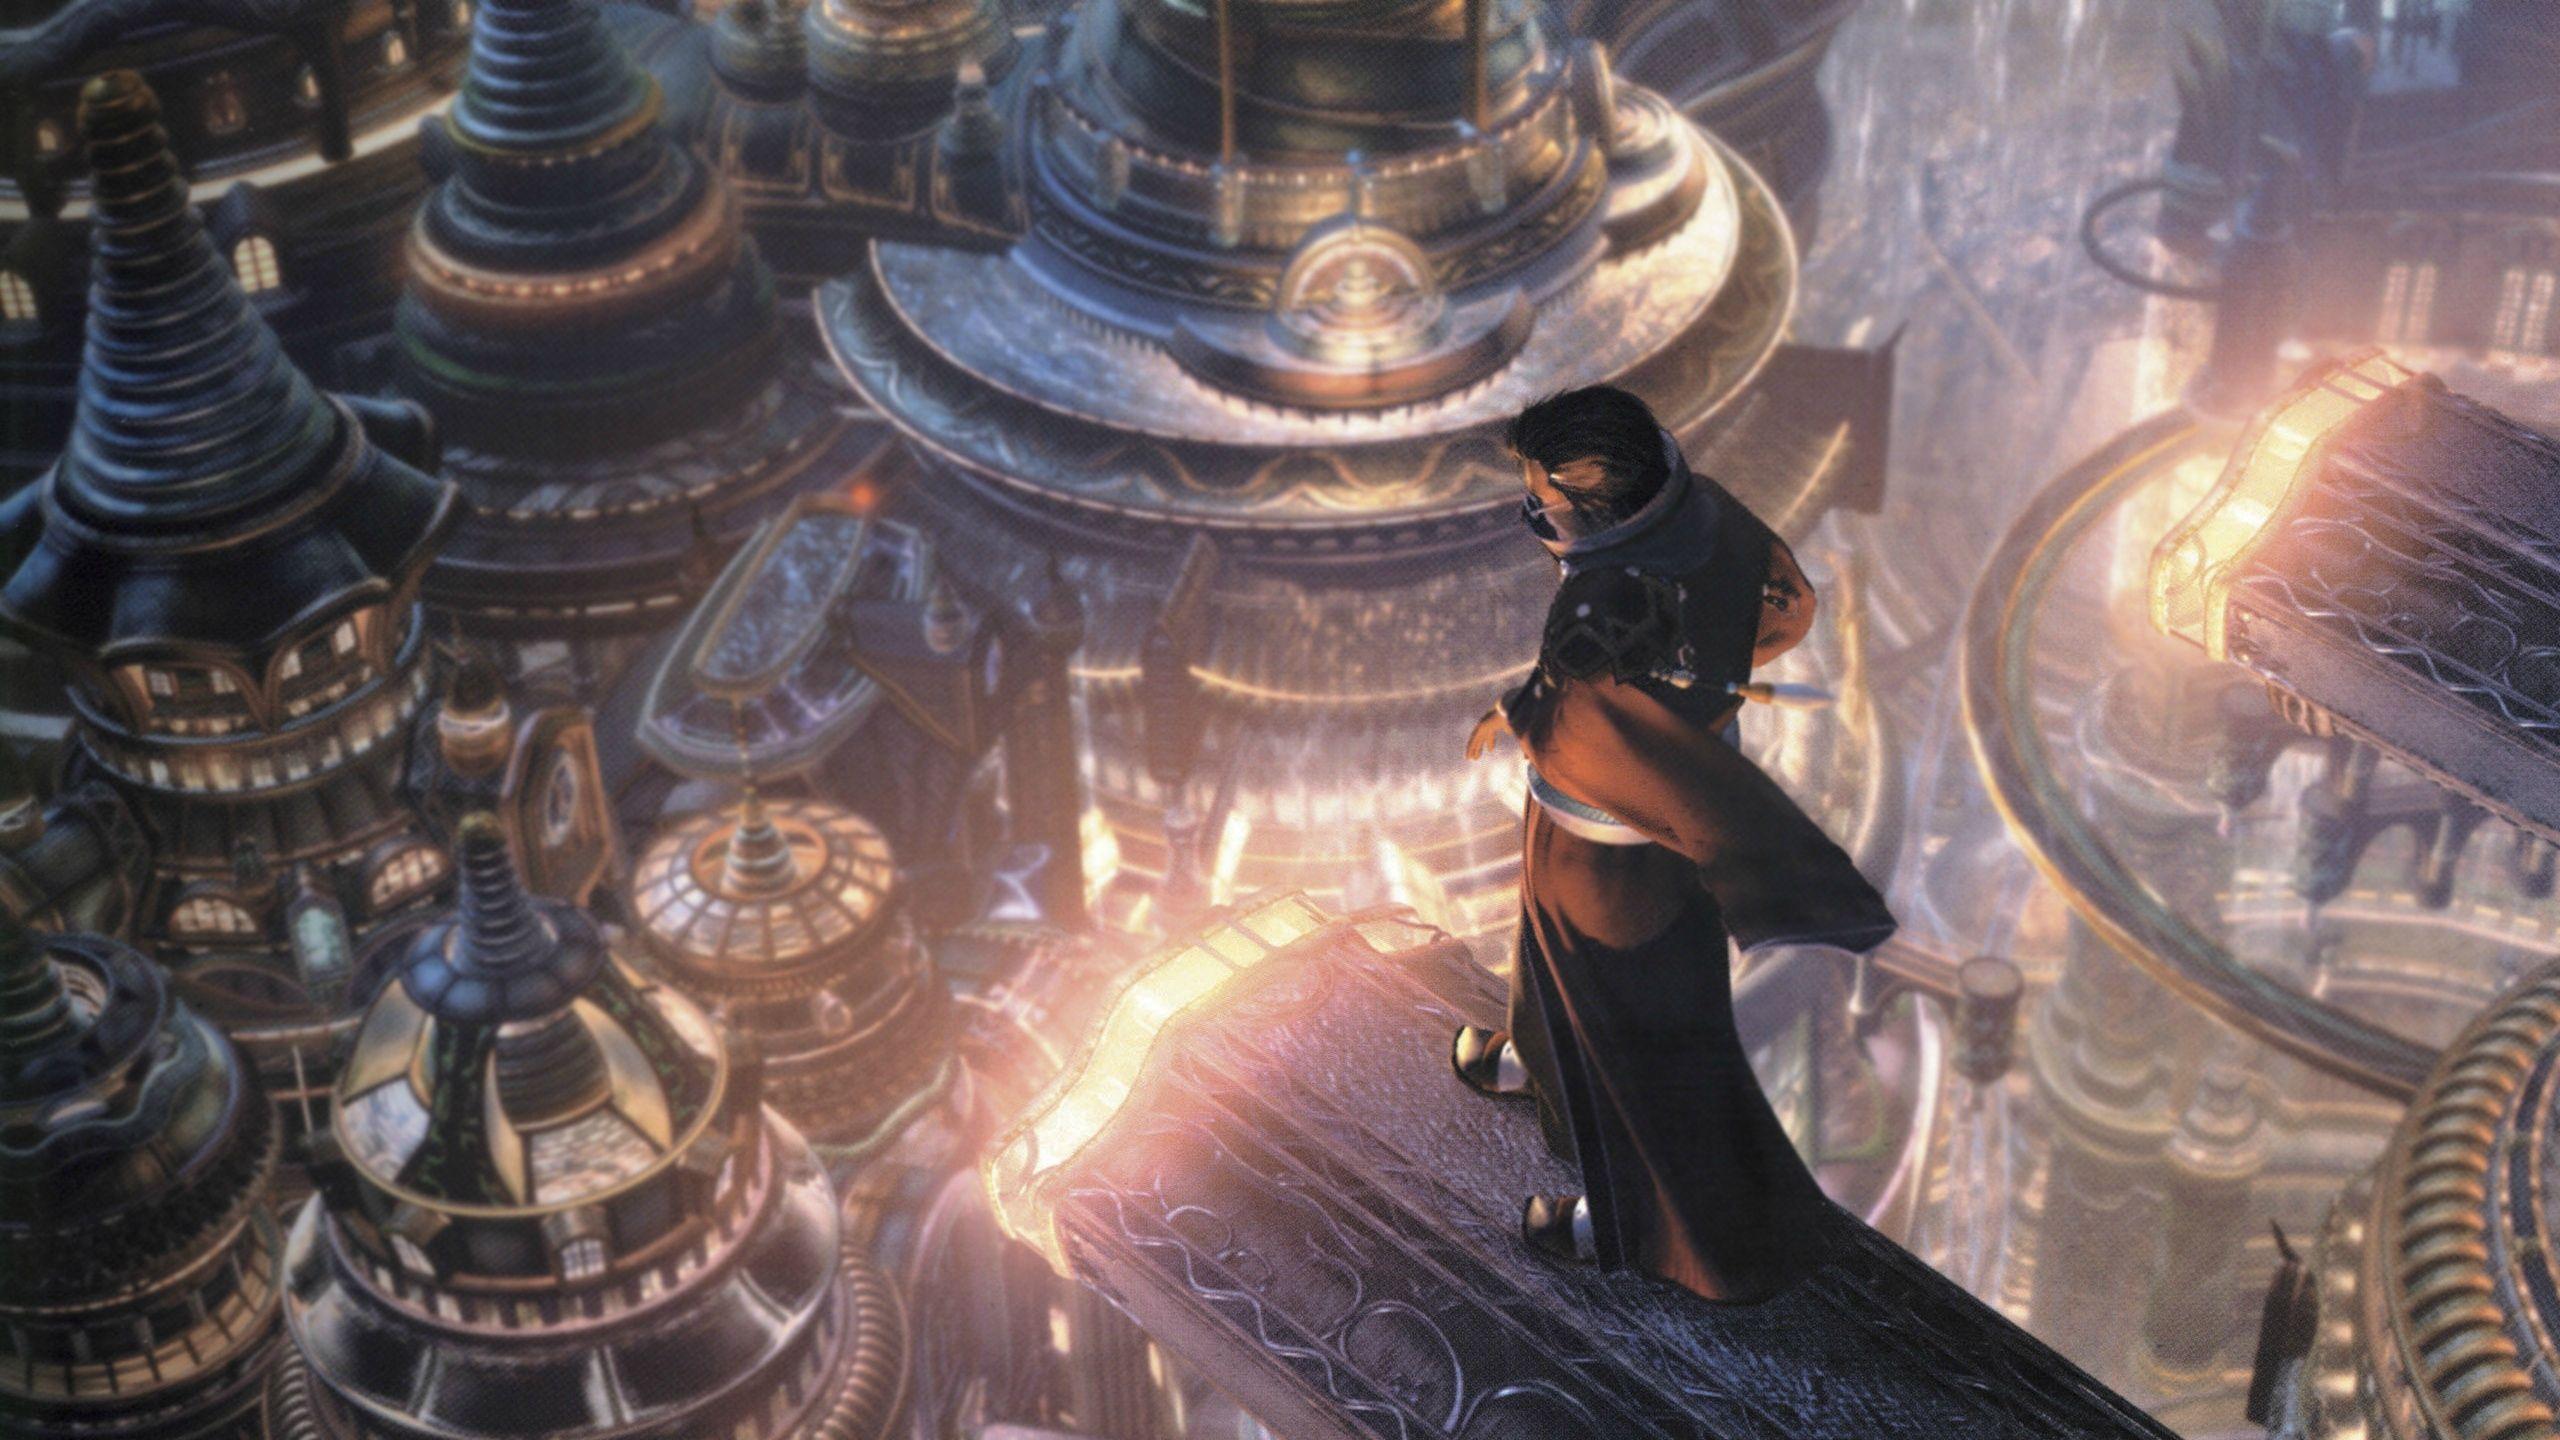 [BOTPOST] Current wallpaper Final Fantasy 10 Auron iimgurcom 2560x1440